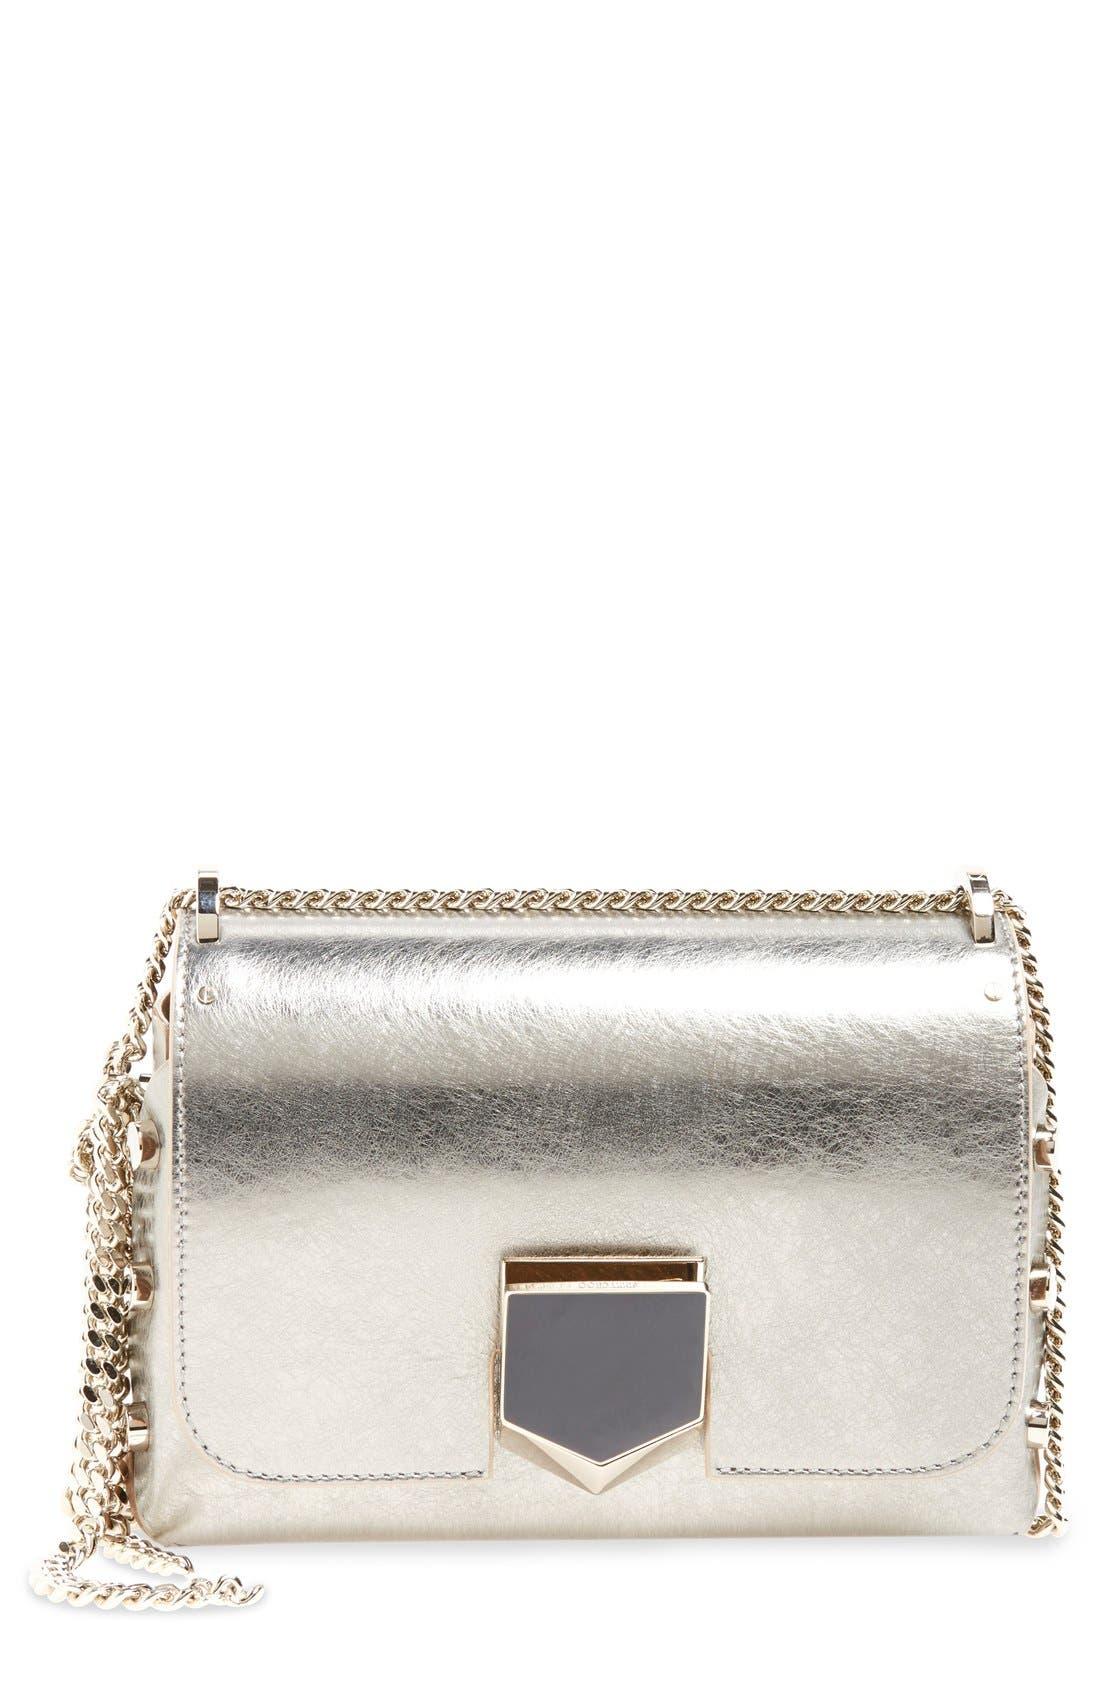 'Lockett Petite' Metallic Leather Shoulder Bag,                             Main thumbnail 2, color,